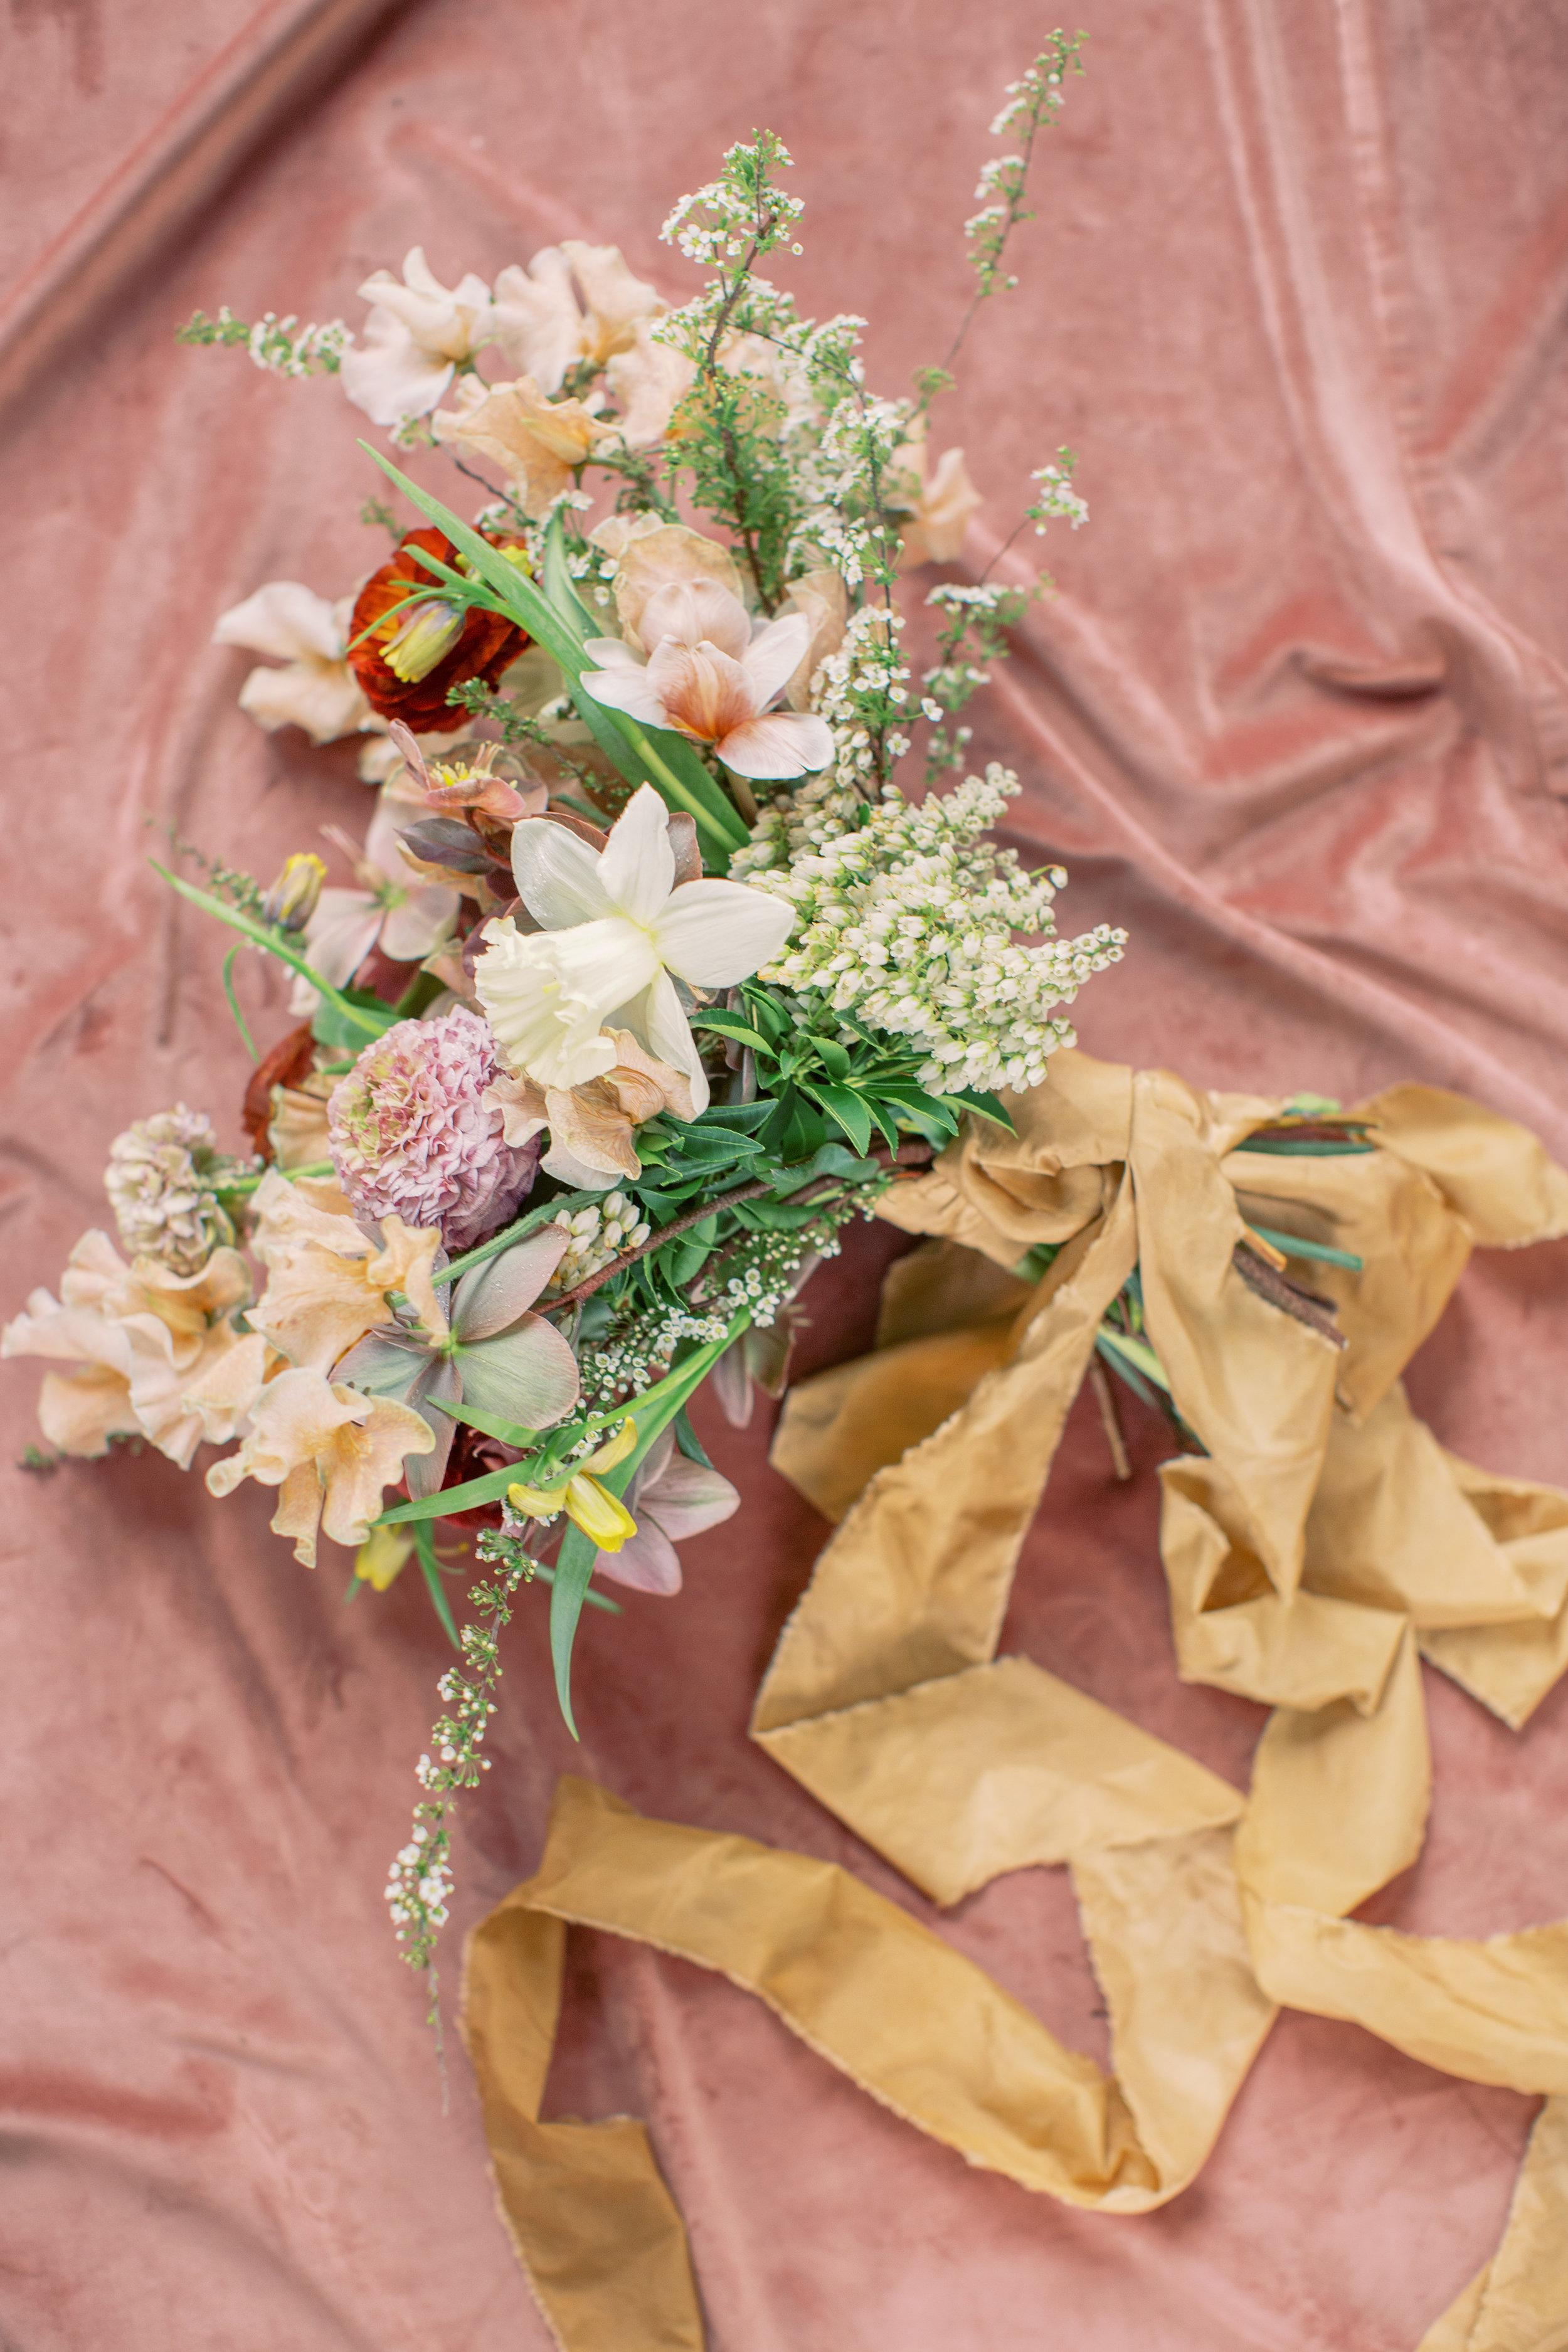 Filoli | Filoli Garden | Wedding | Amanda Crean Photography | Bustle Events | Amanda Vidmar Designs